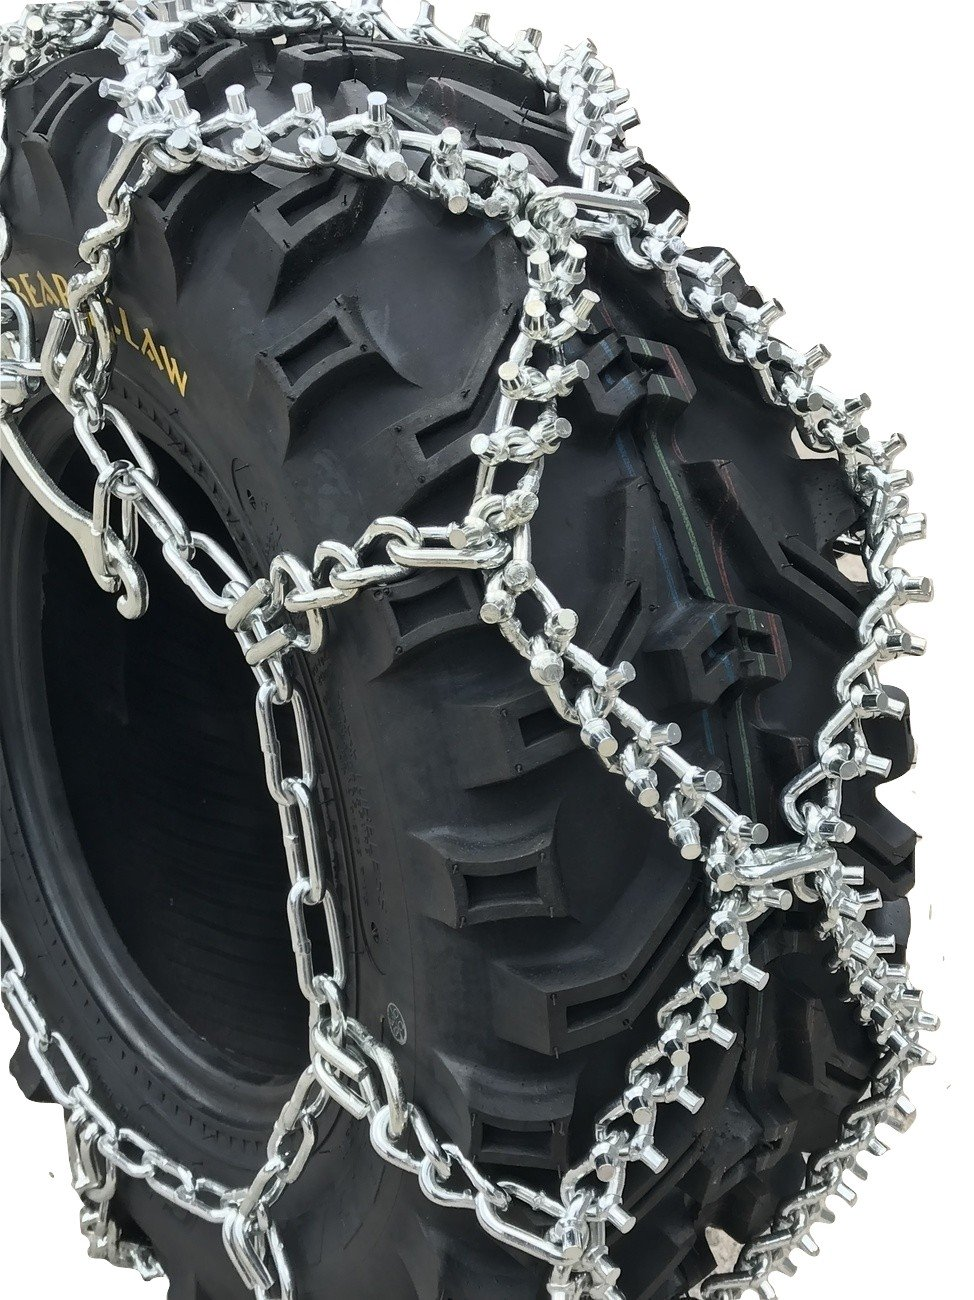 TireChain.com 25x10-12, 25 10 12 ATV UTV Stud Tire Chains, Priced per Pair